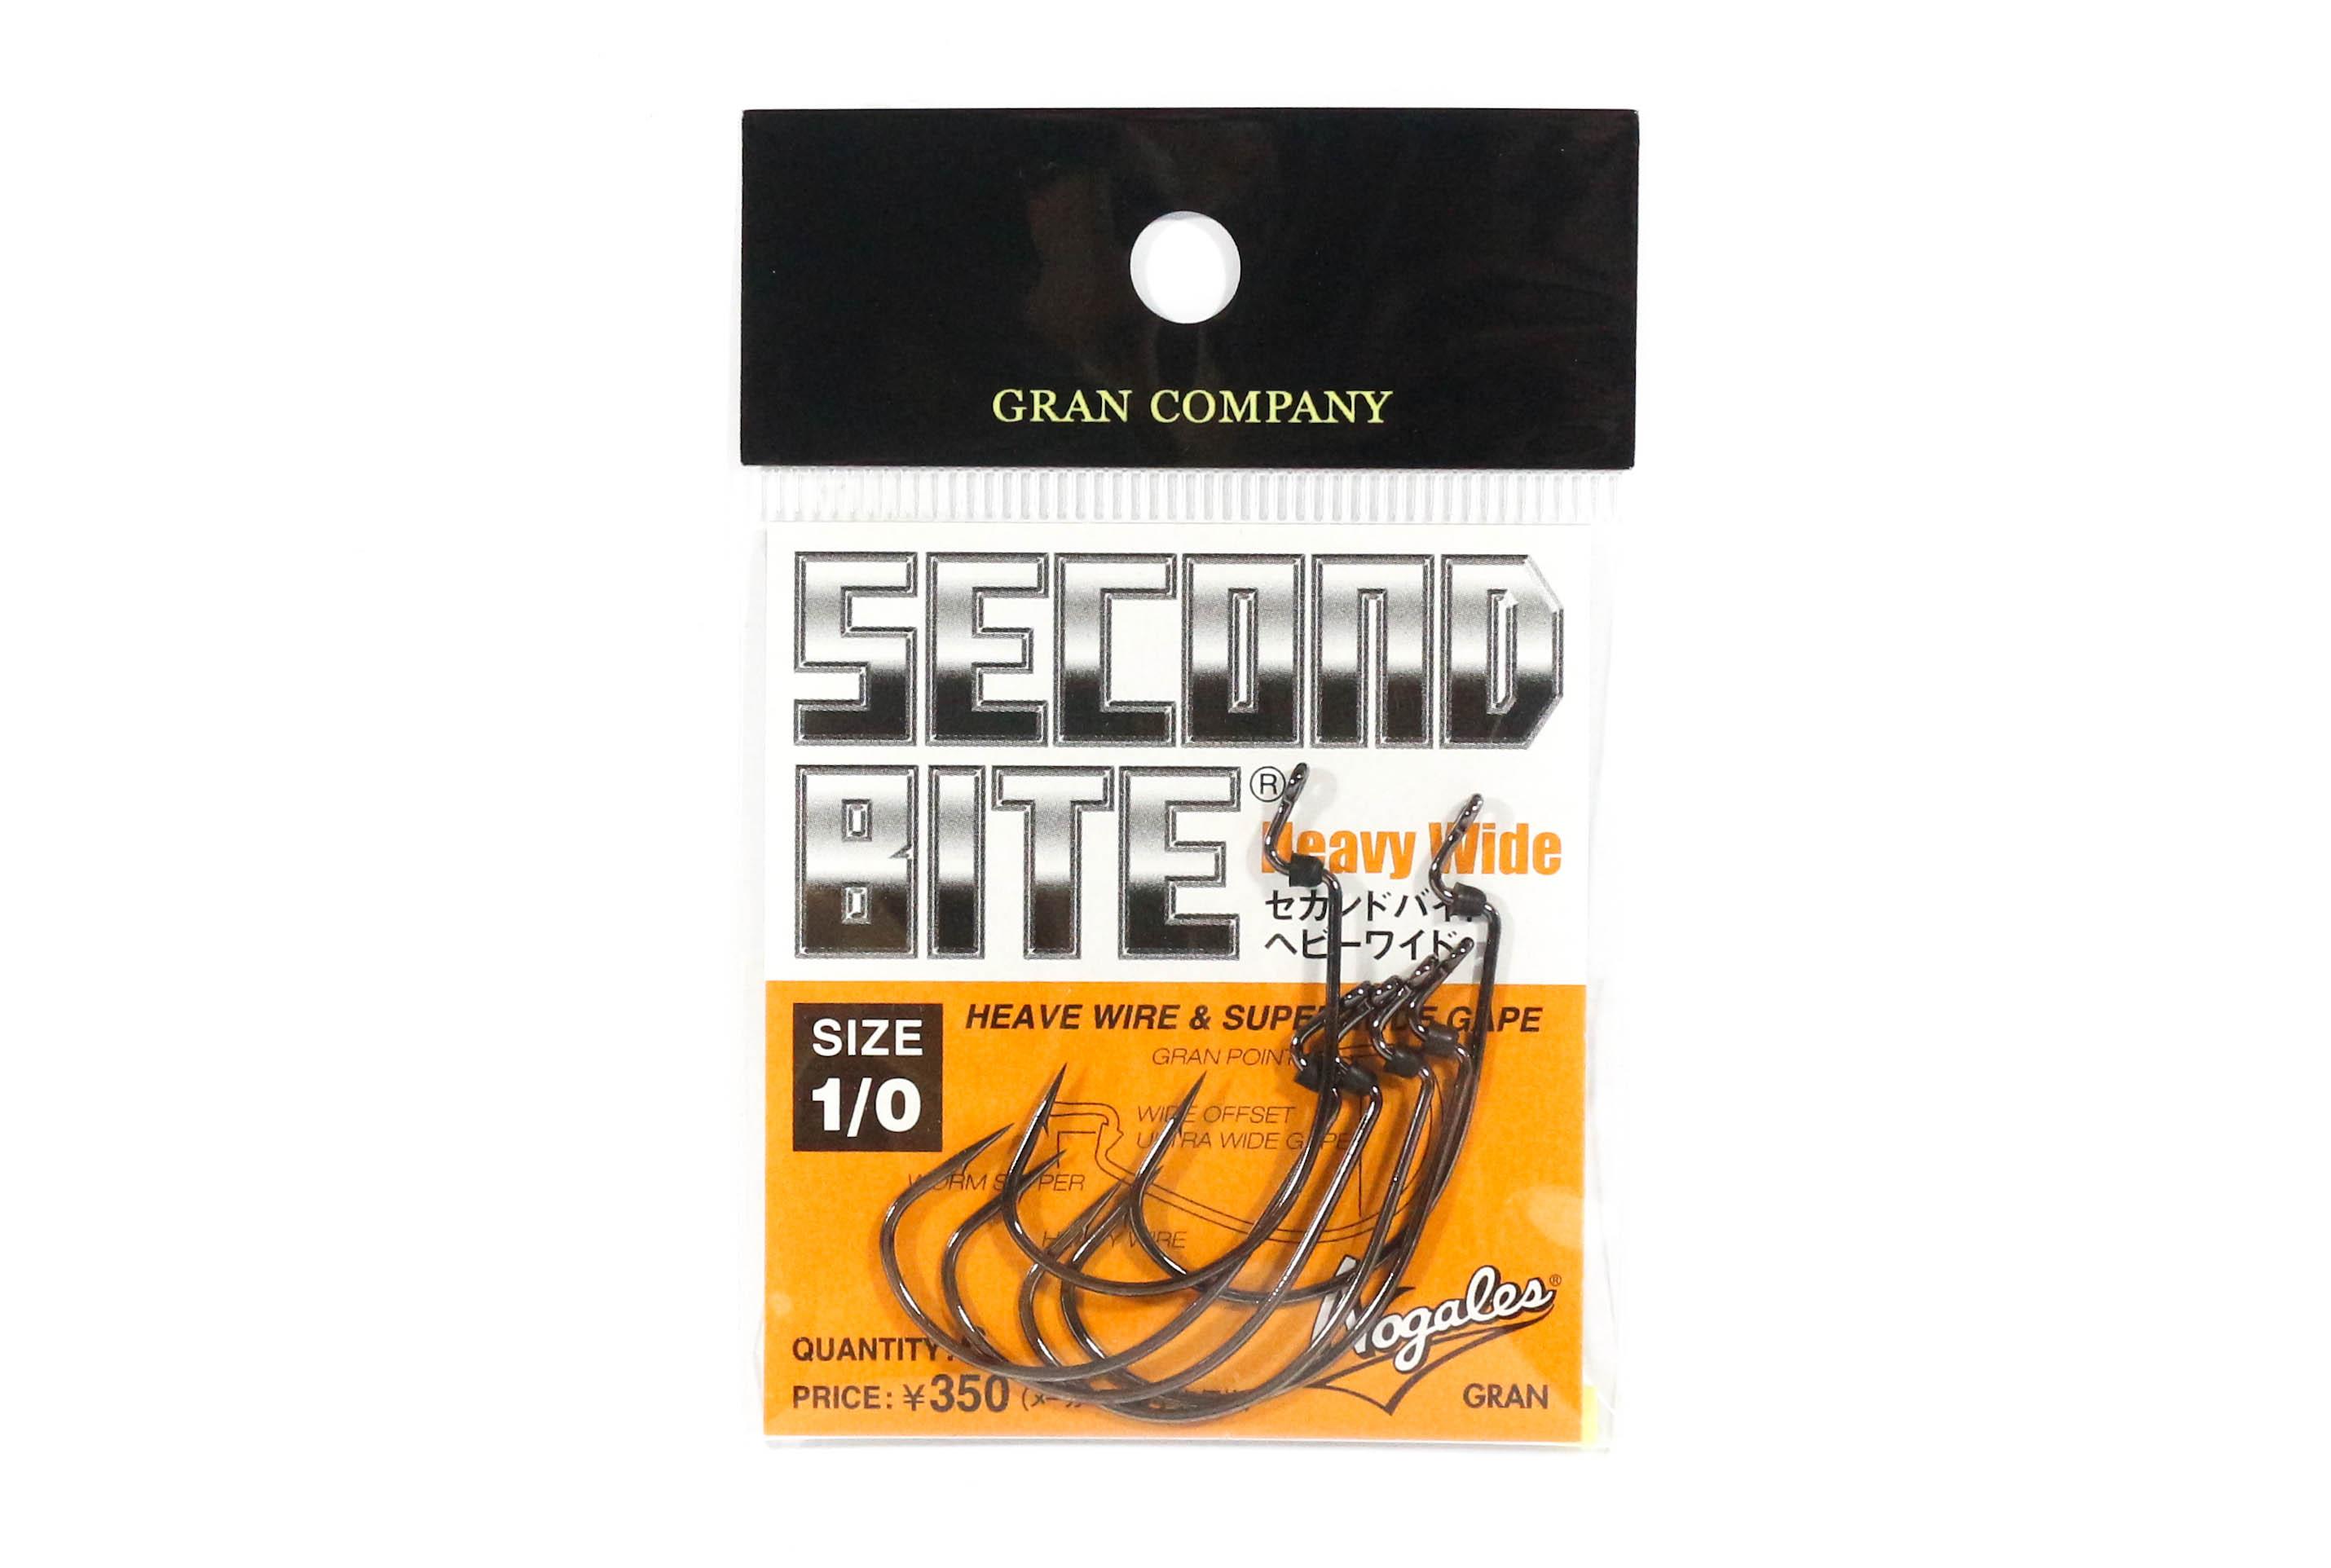 Sale Varivas Hooking Master Worm Hook Second Bite Heavy Wide Size 1/0 (6802)